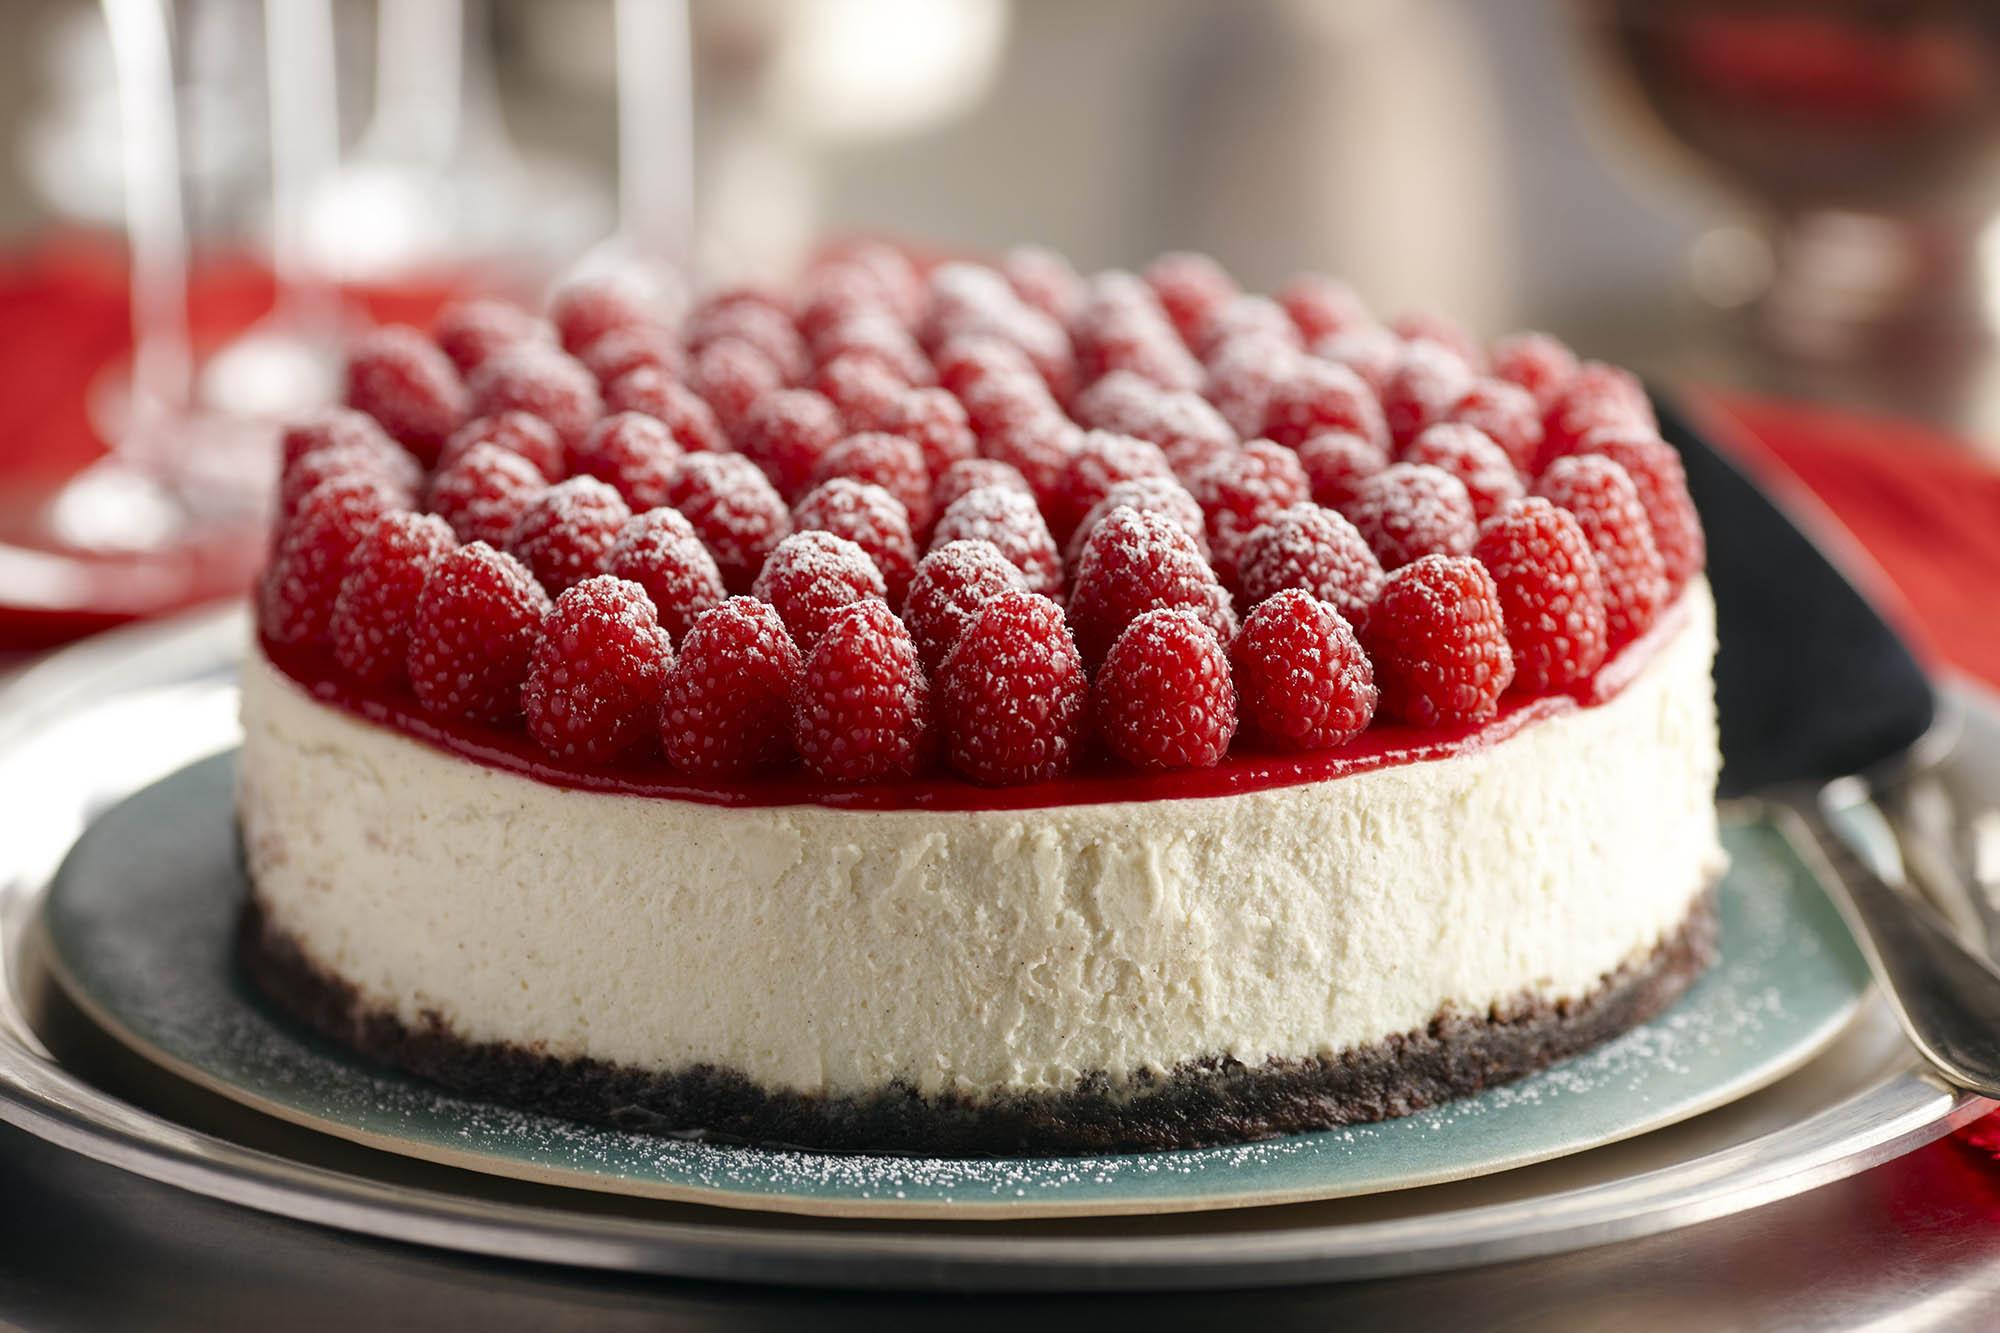 Raspberry Cheesecake With Grand Marnier